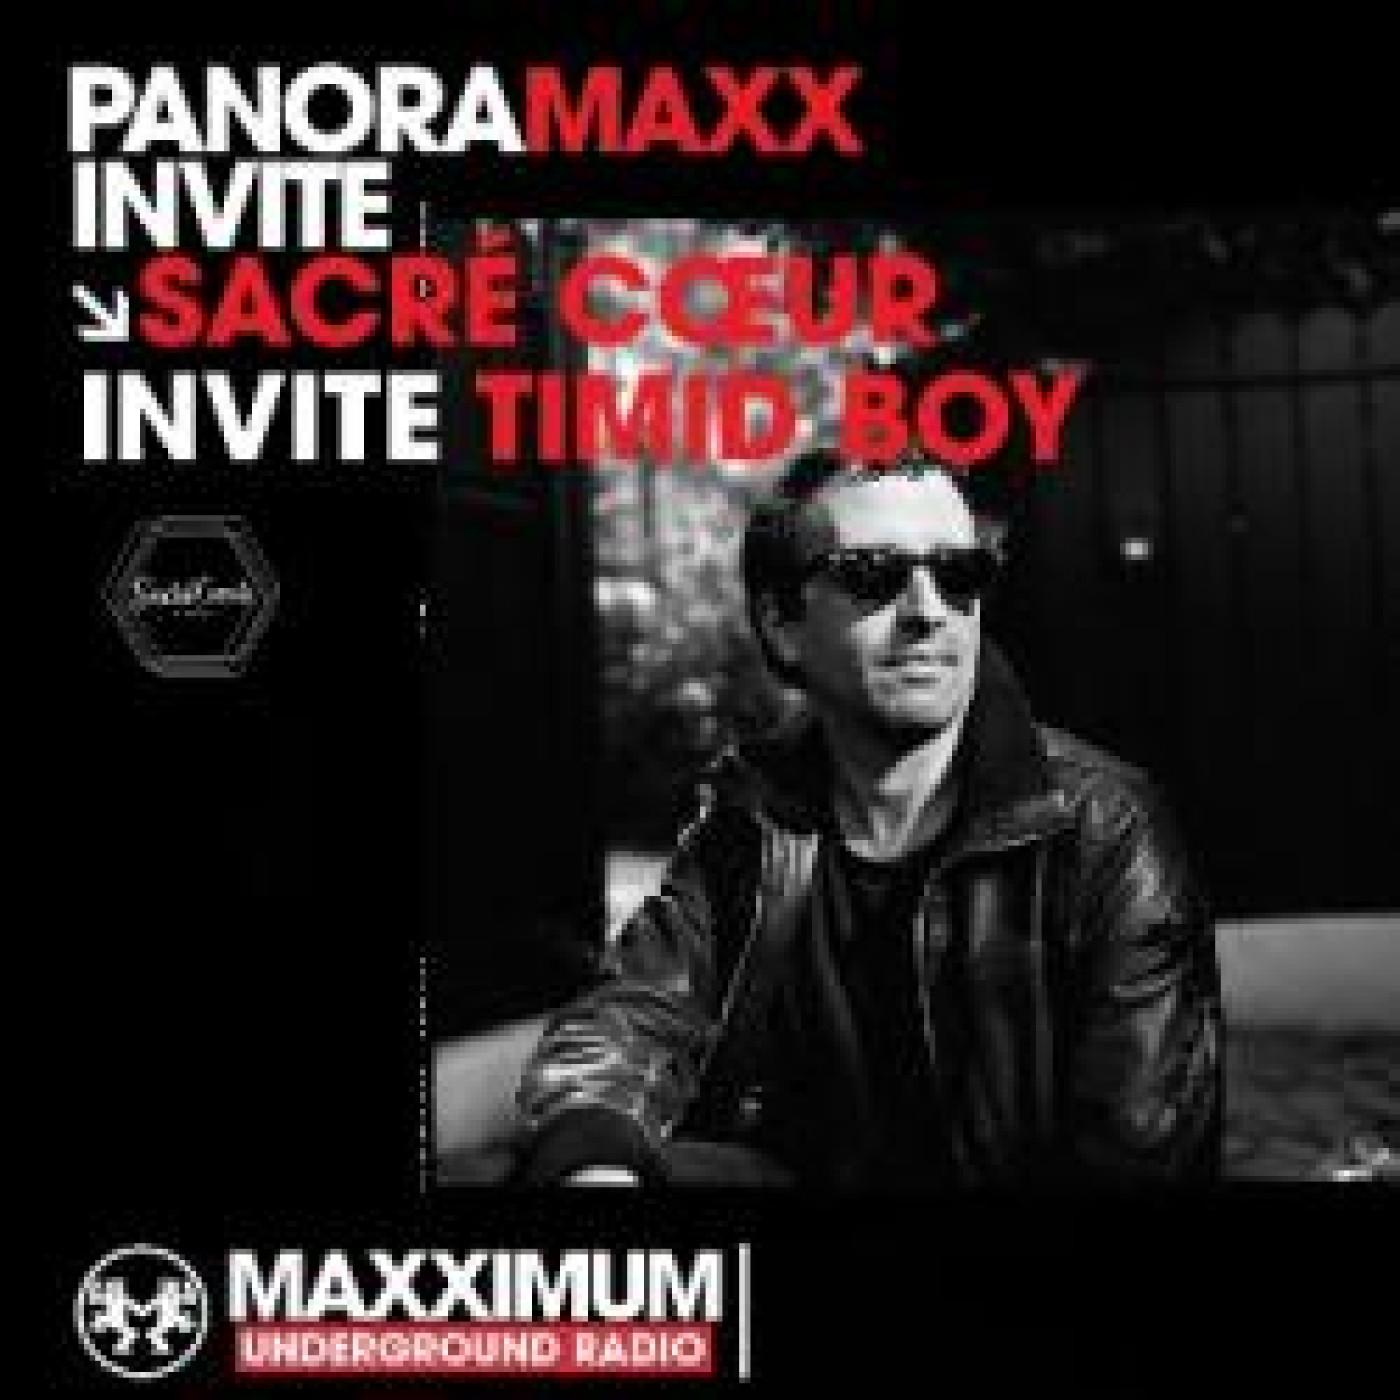 PANORAMAXX : TIMID BOY